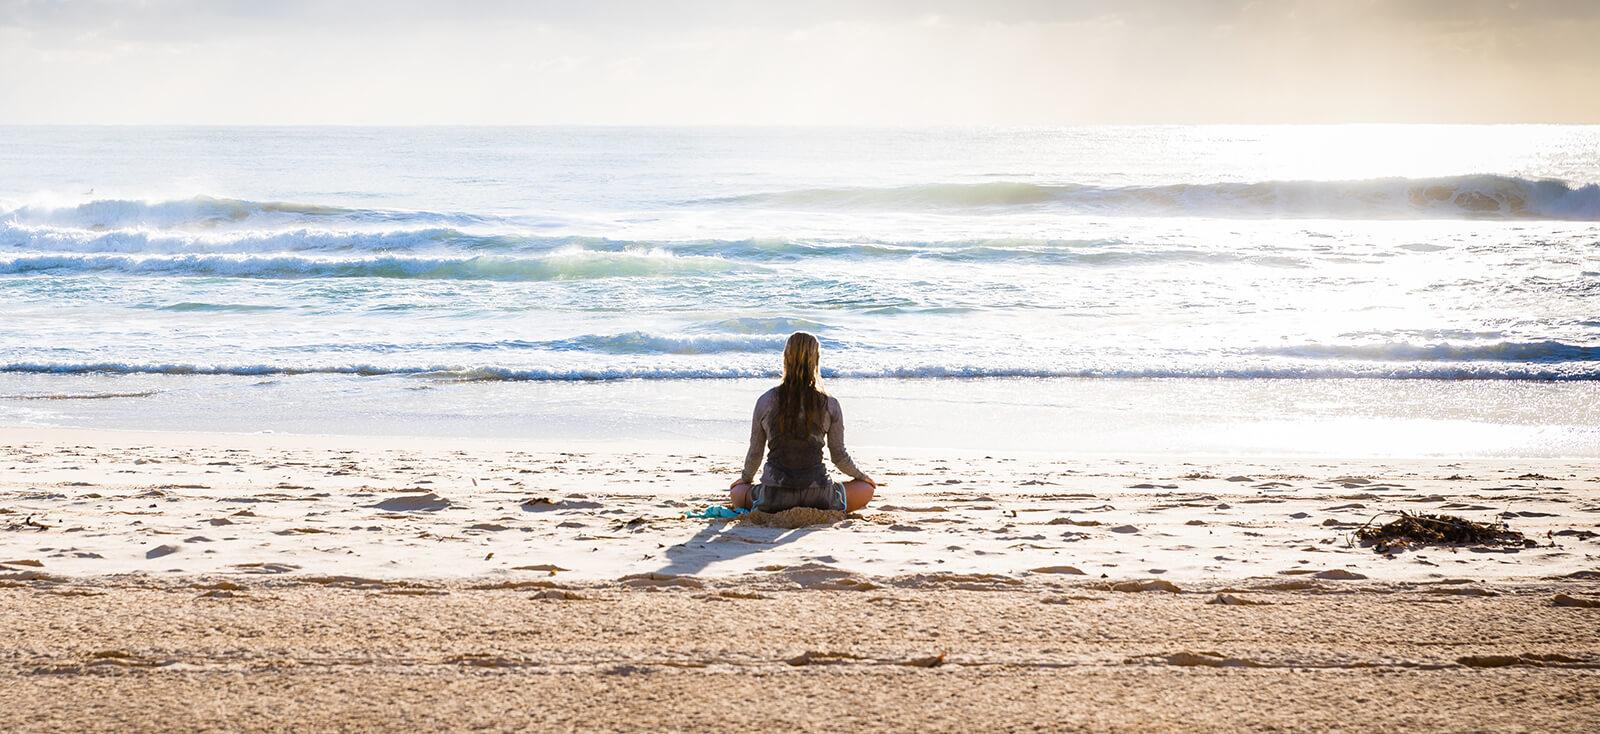 Woman meditating on a beach shore